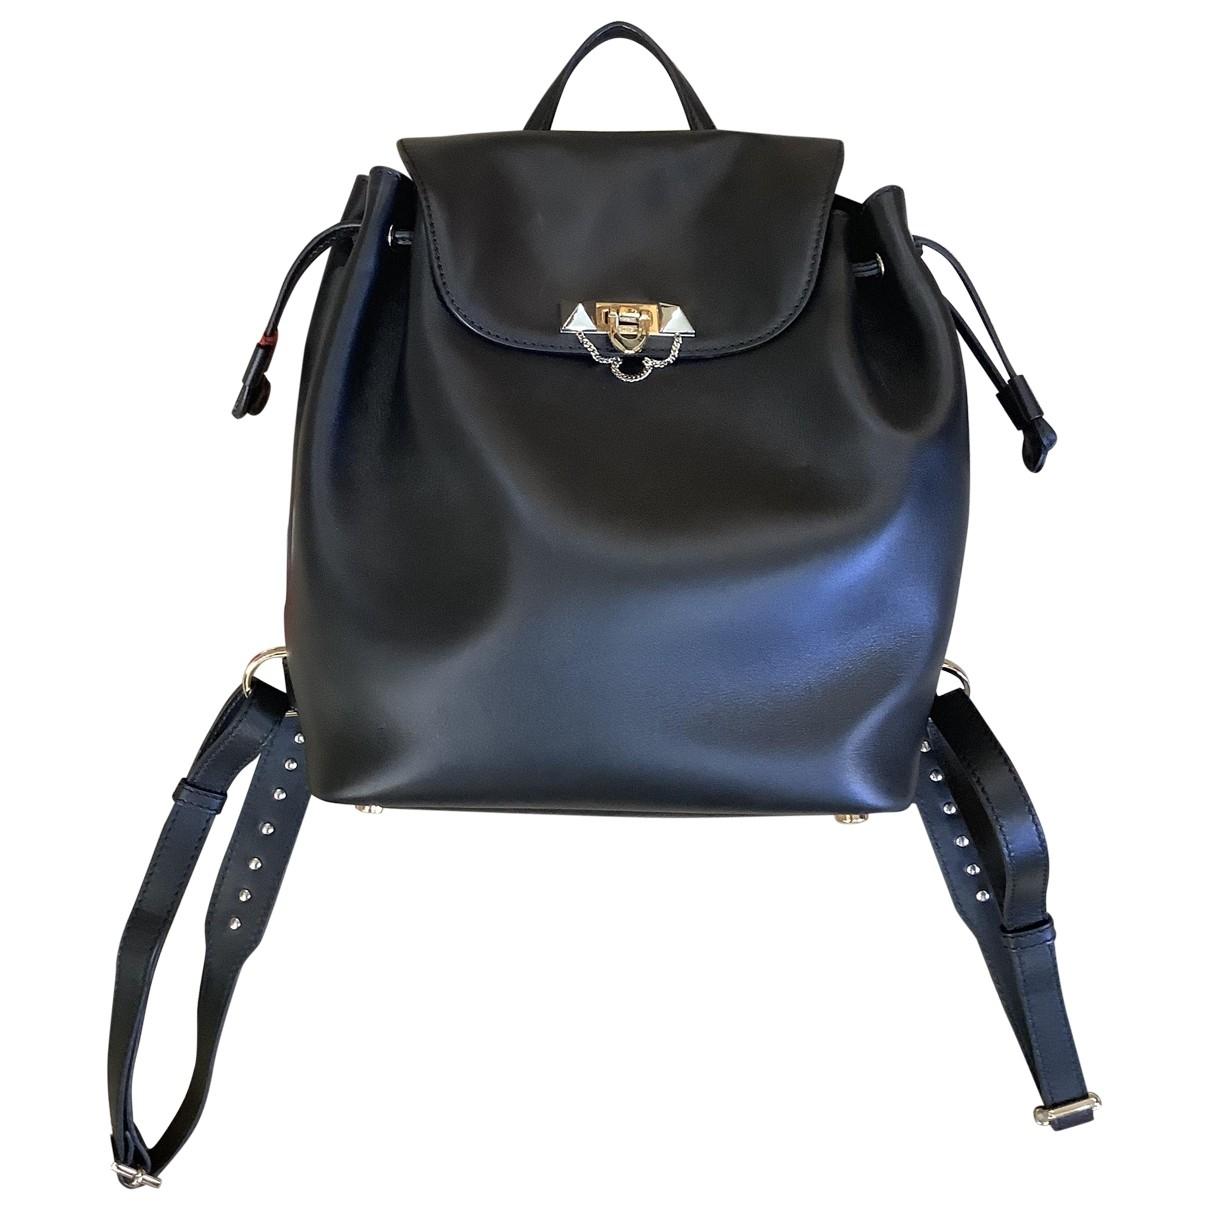 Valentino Garavani - Sac a dos Rockstud pour femme en cuir - noir